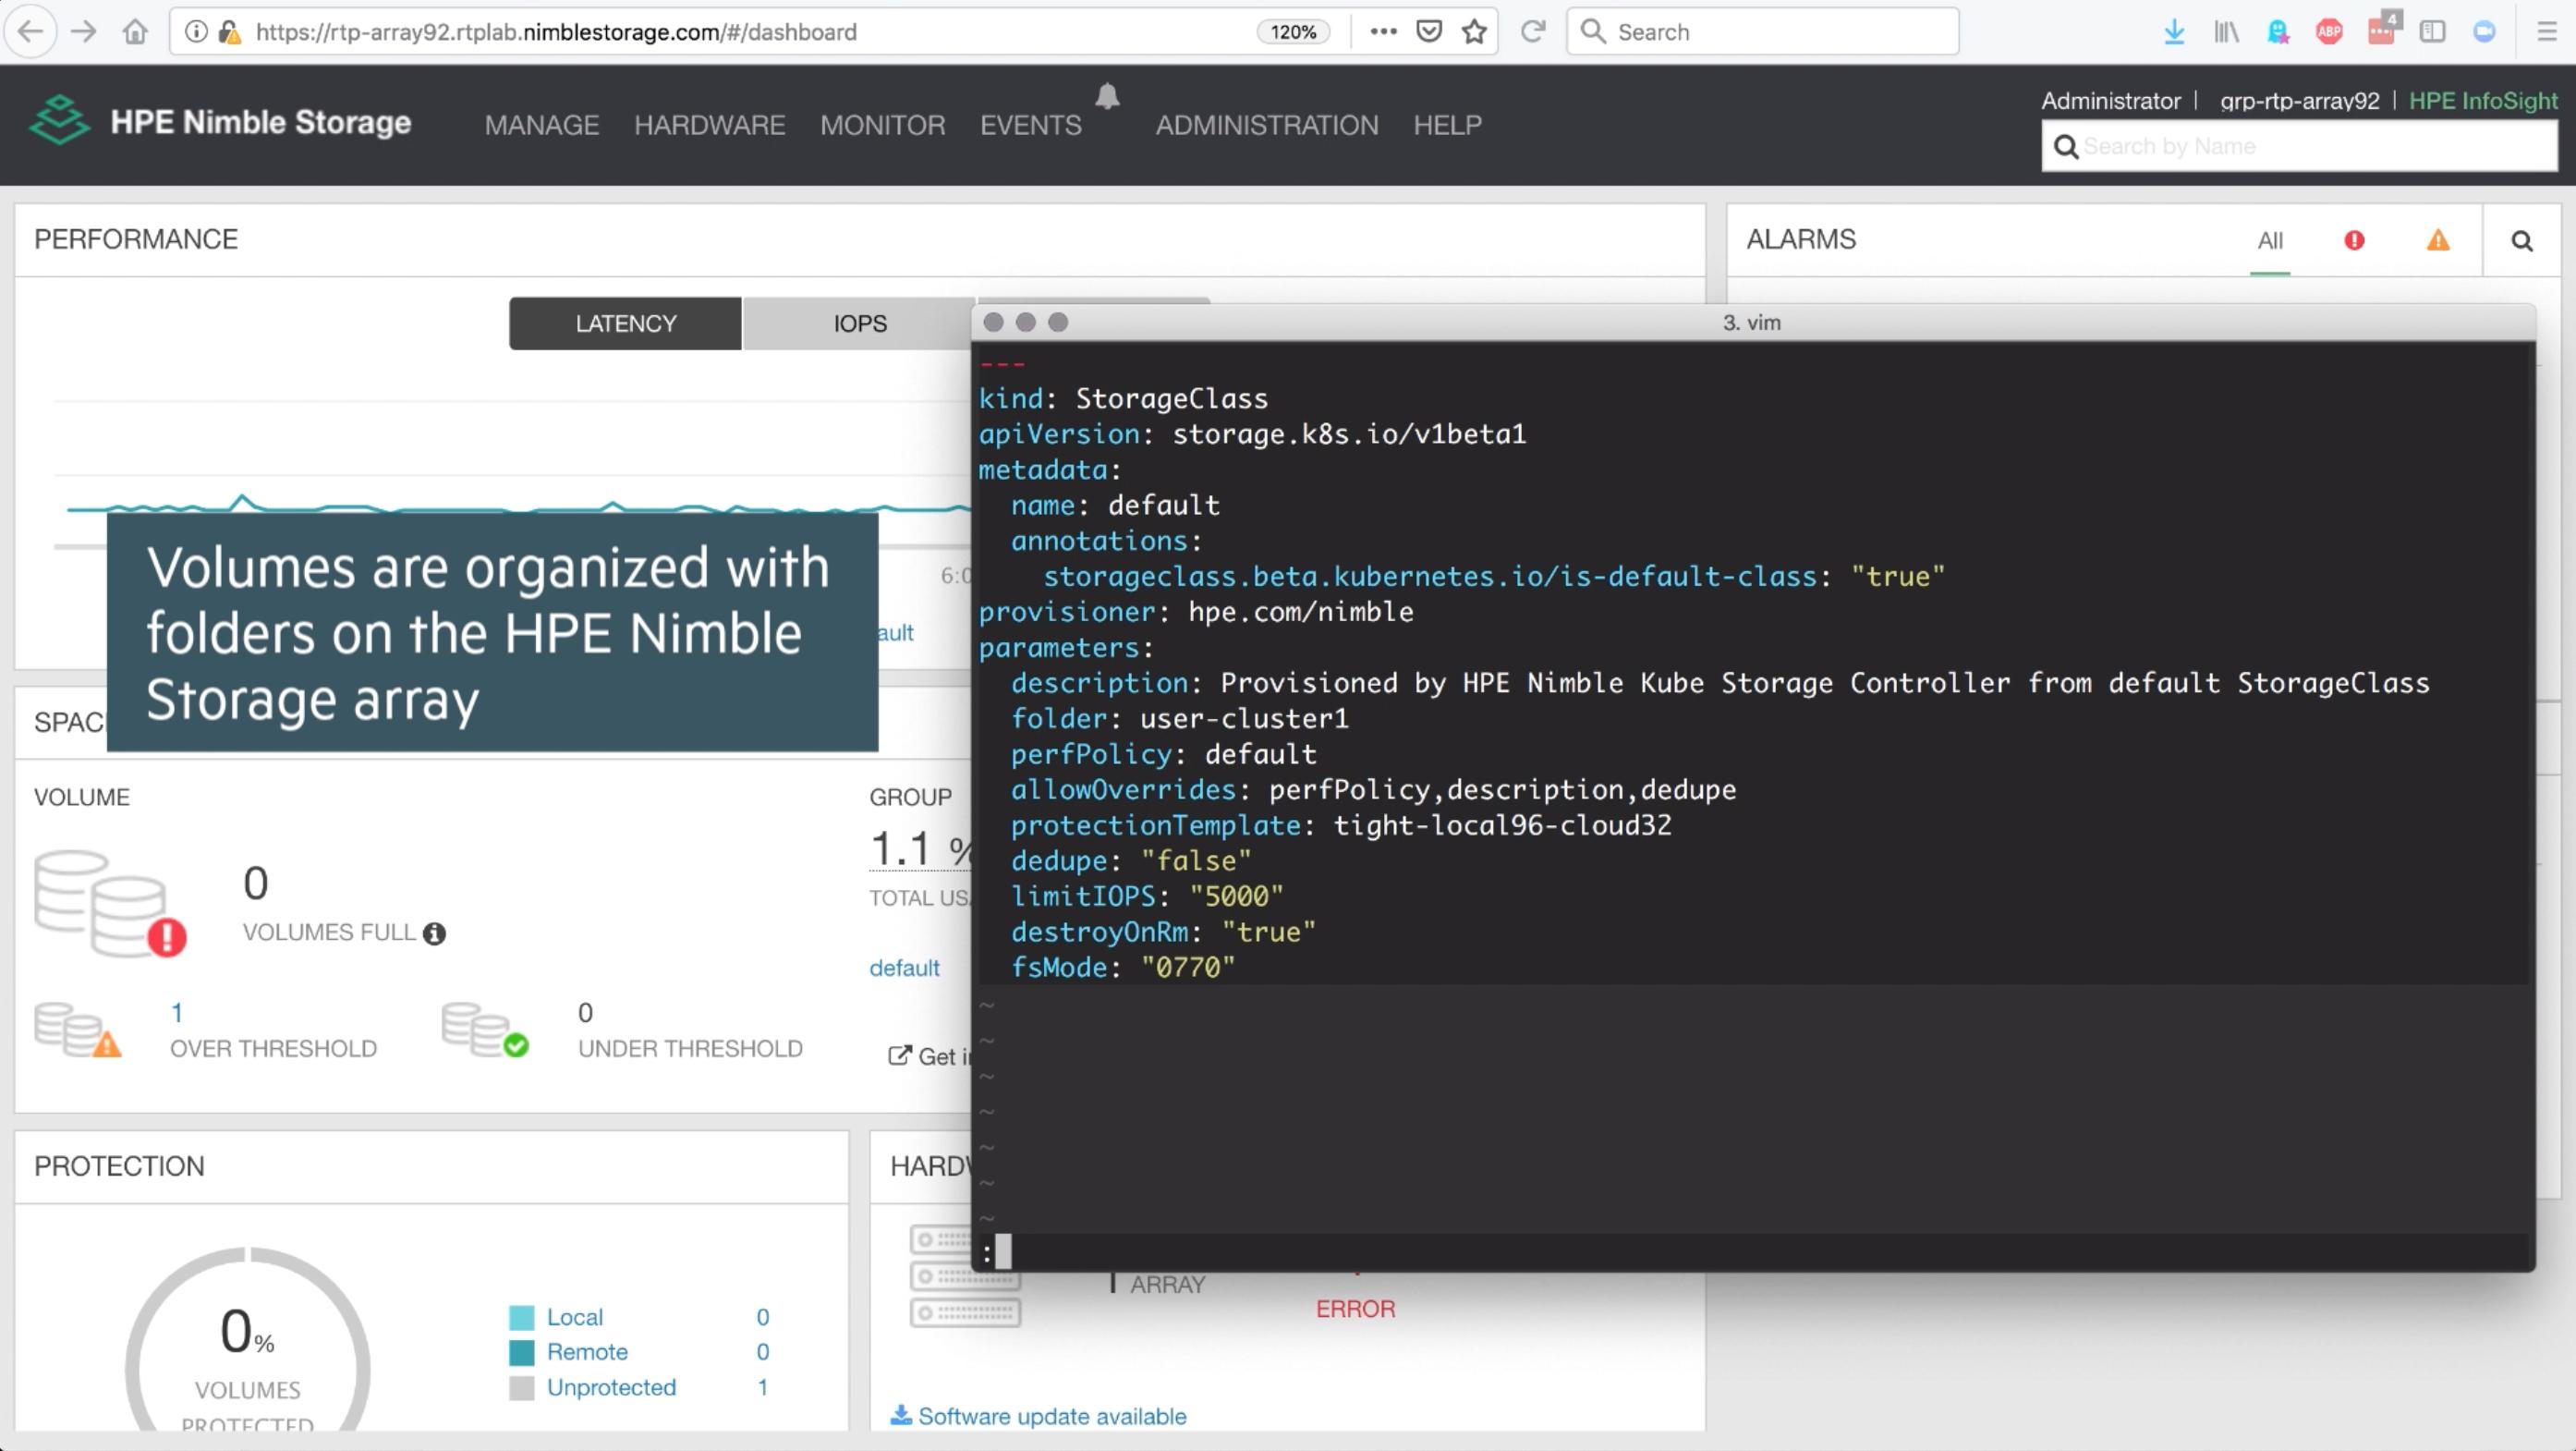 StorageClass API Object using the HPE Nimble Kube Storage Controller